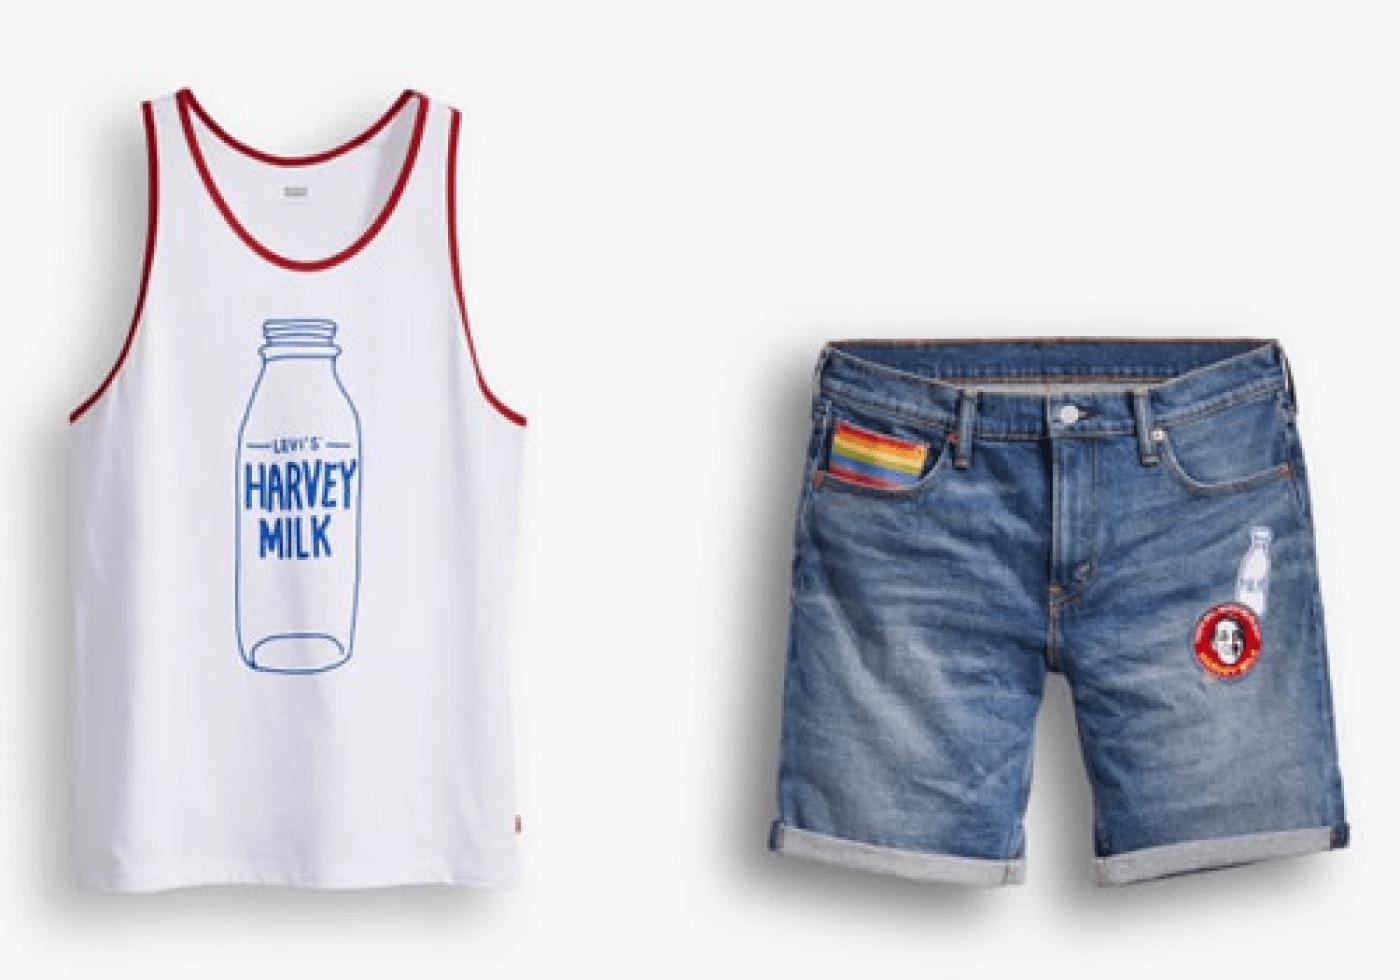 LEVI'S_Harvey_Milk Foundation_Pride_2016_collection